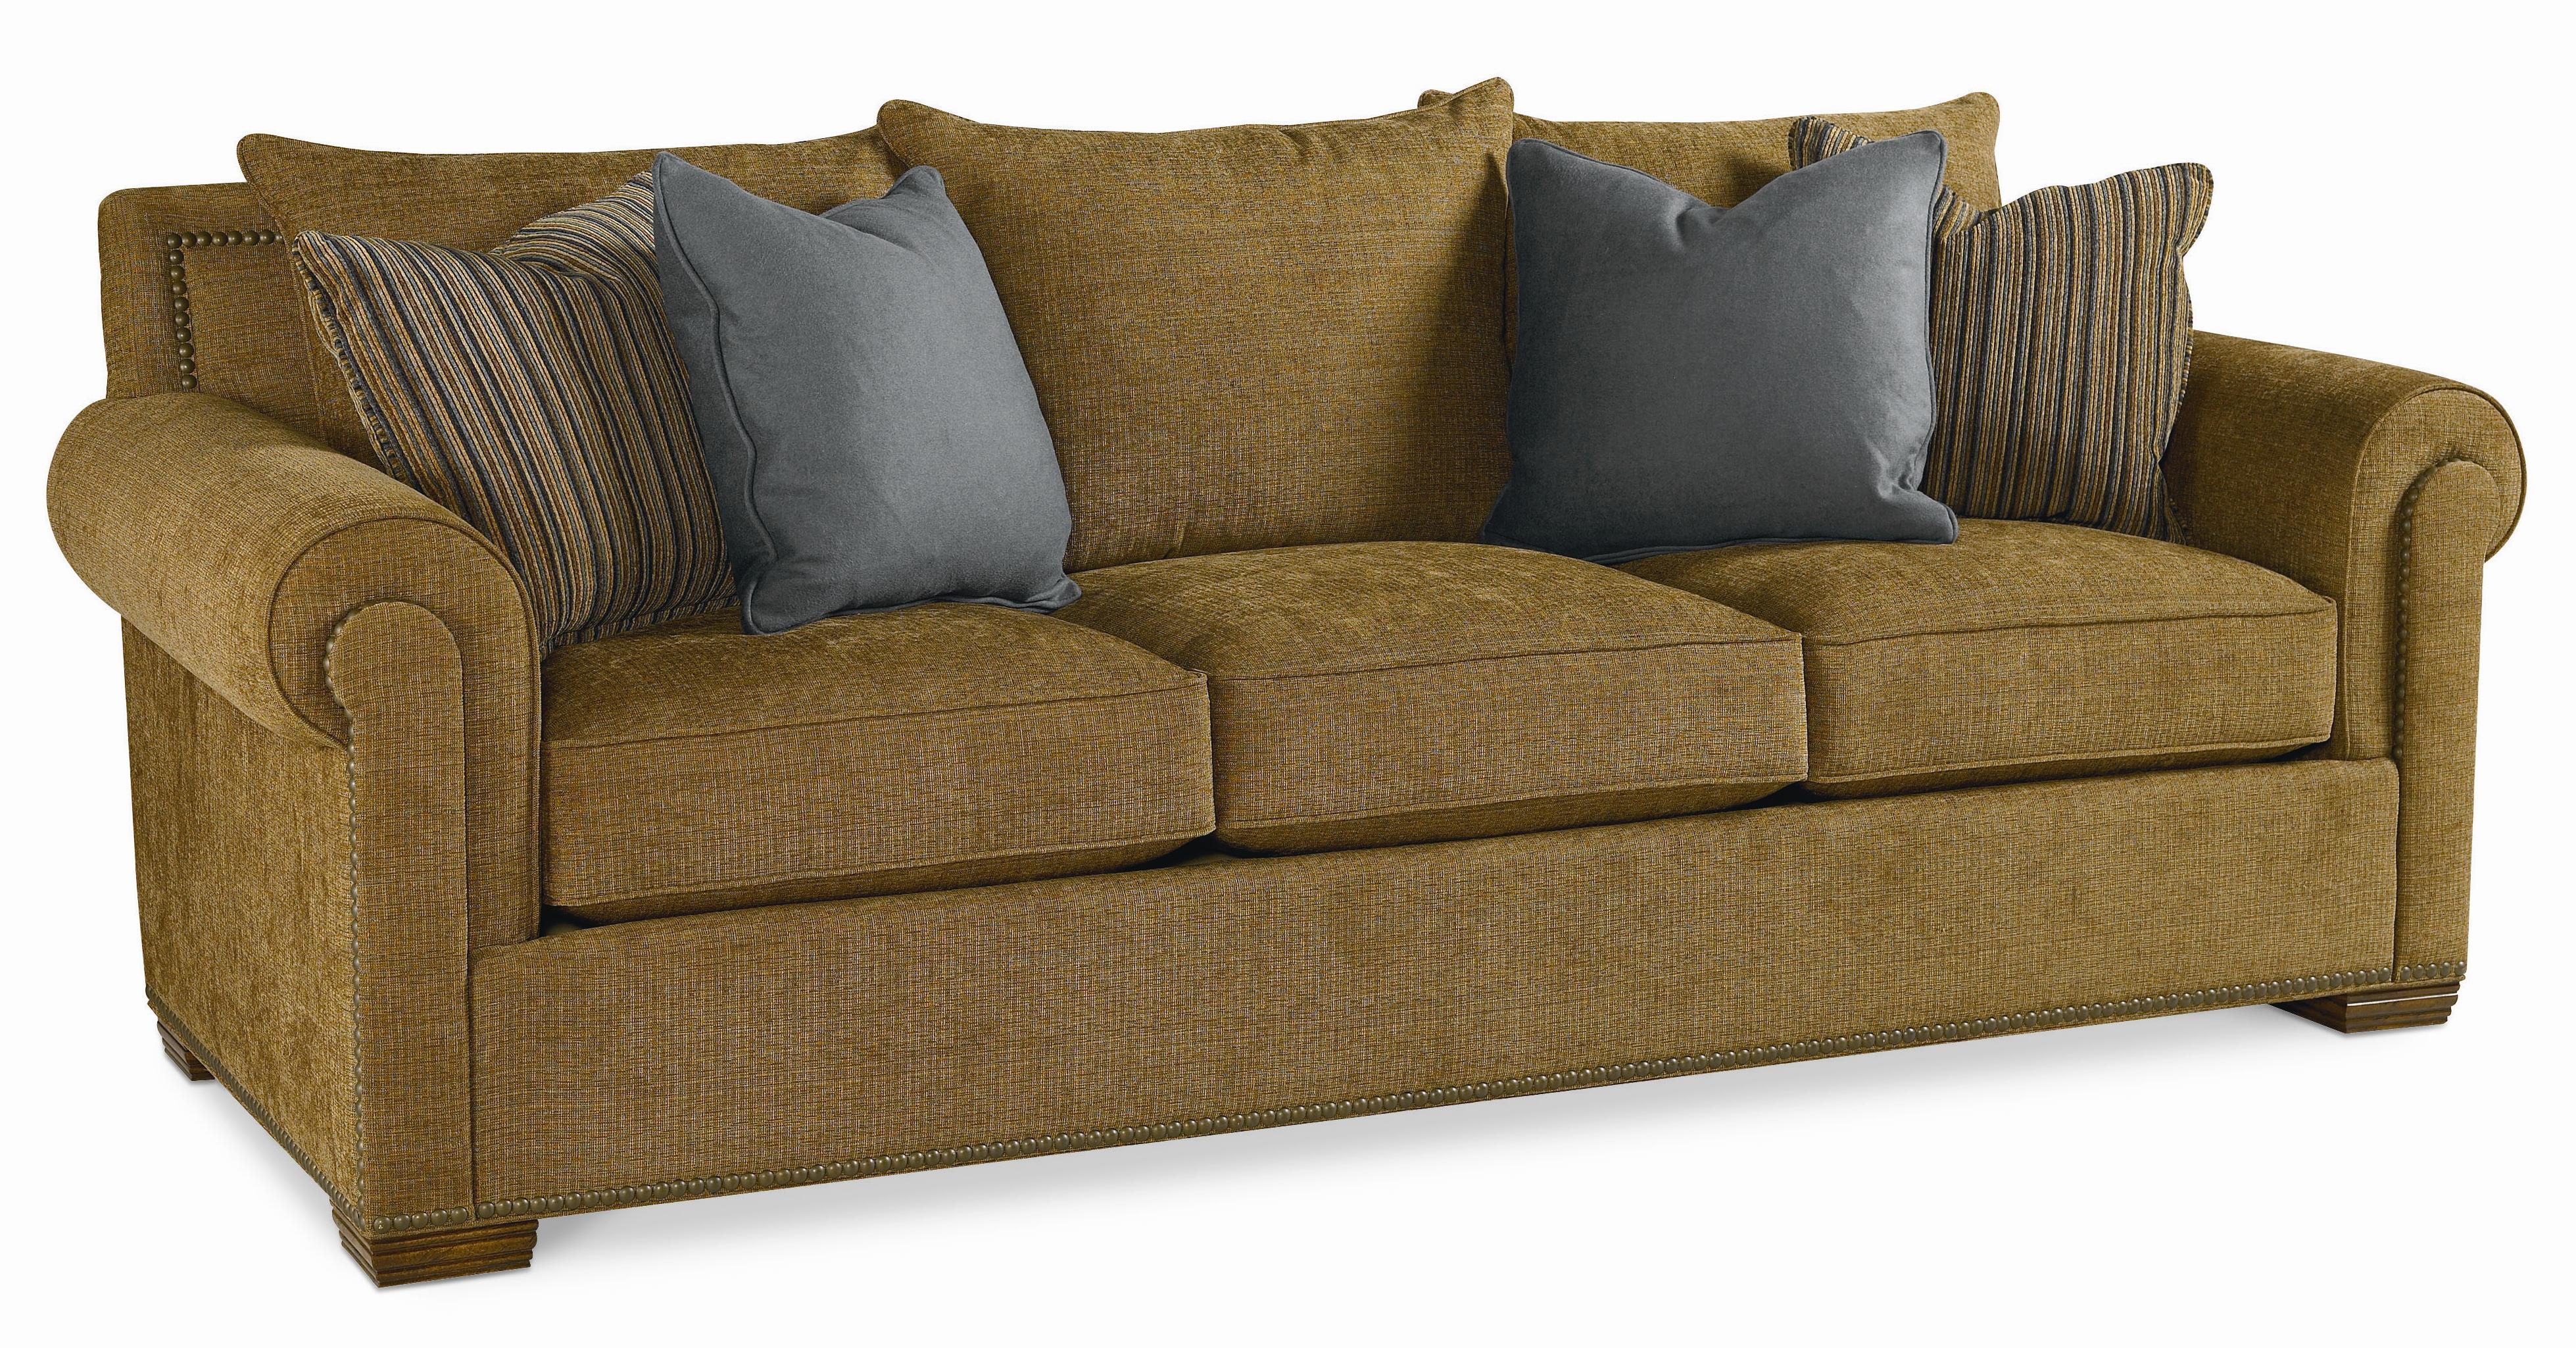 Thomasville Fremont 1658 11 3 Seat Stationary Sofa Dunk Bright Furniture Sofa